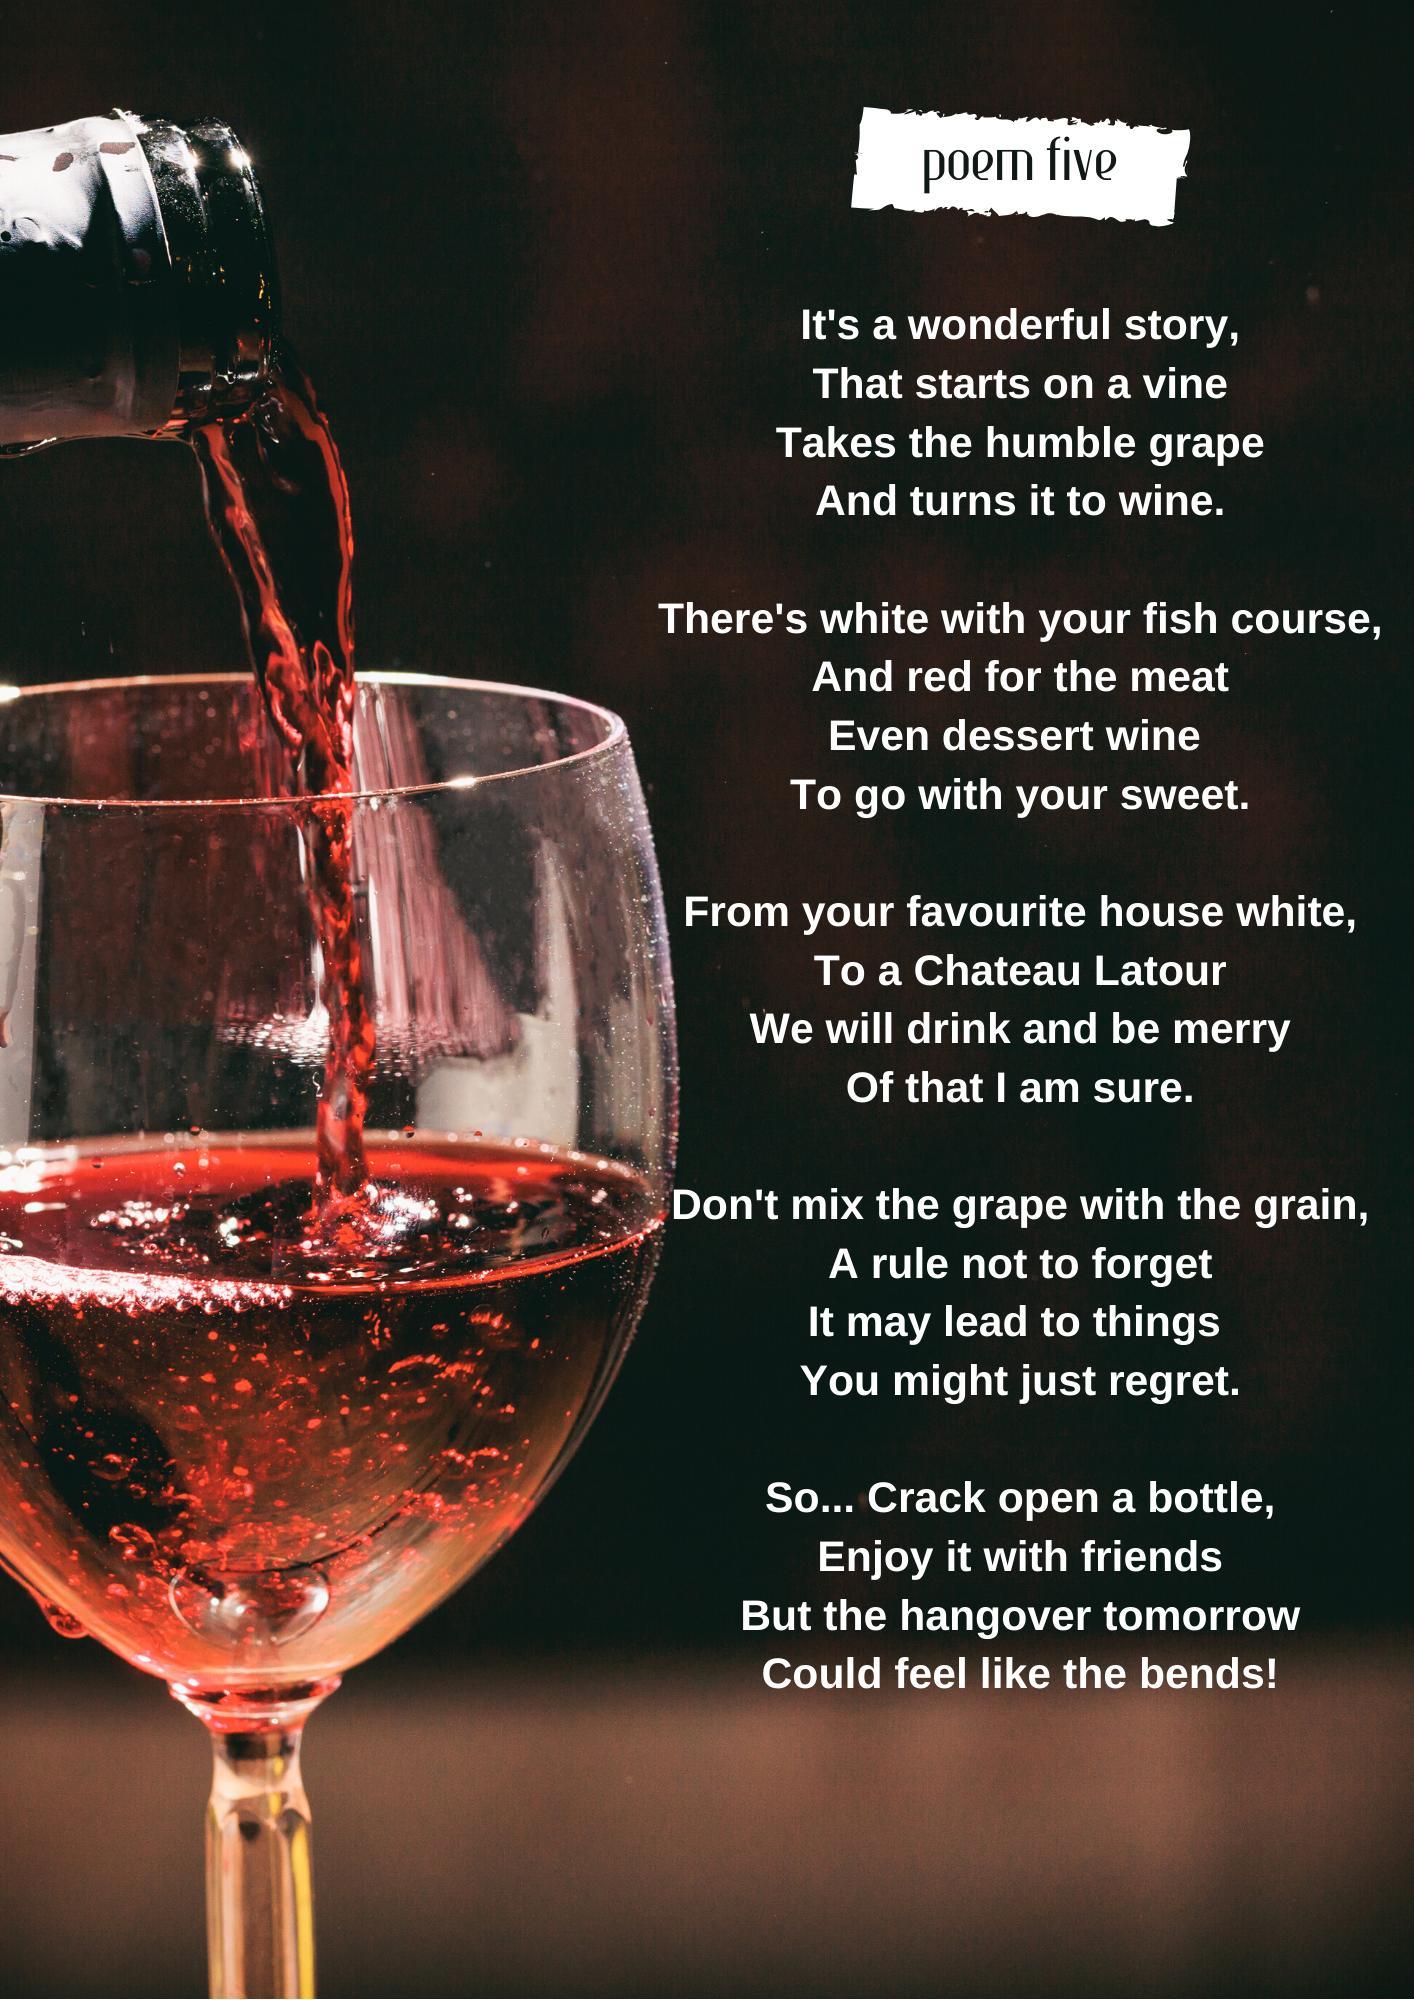 The winning poem by Carol-Anne Wilson